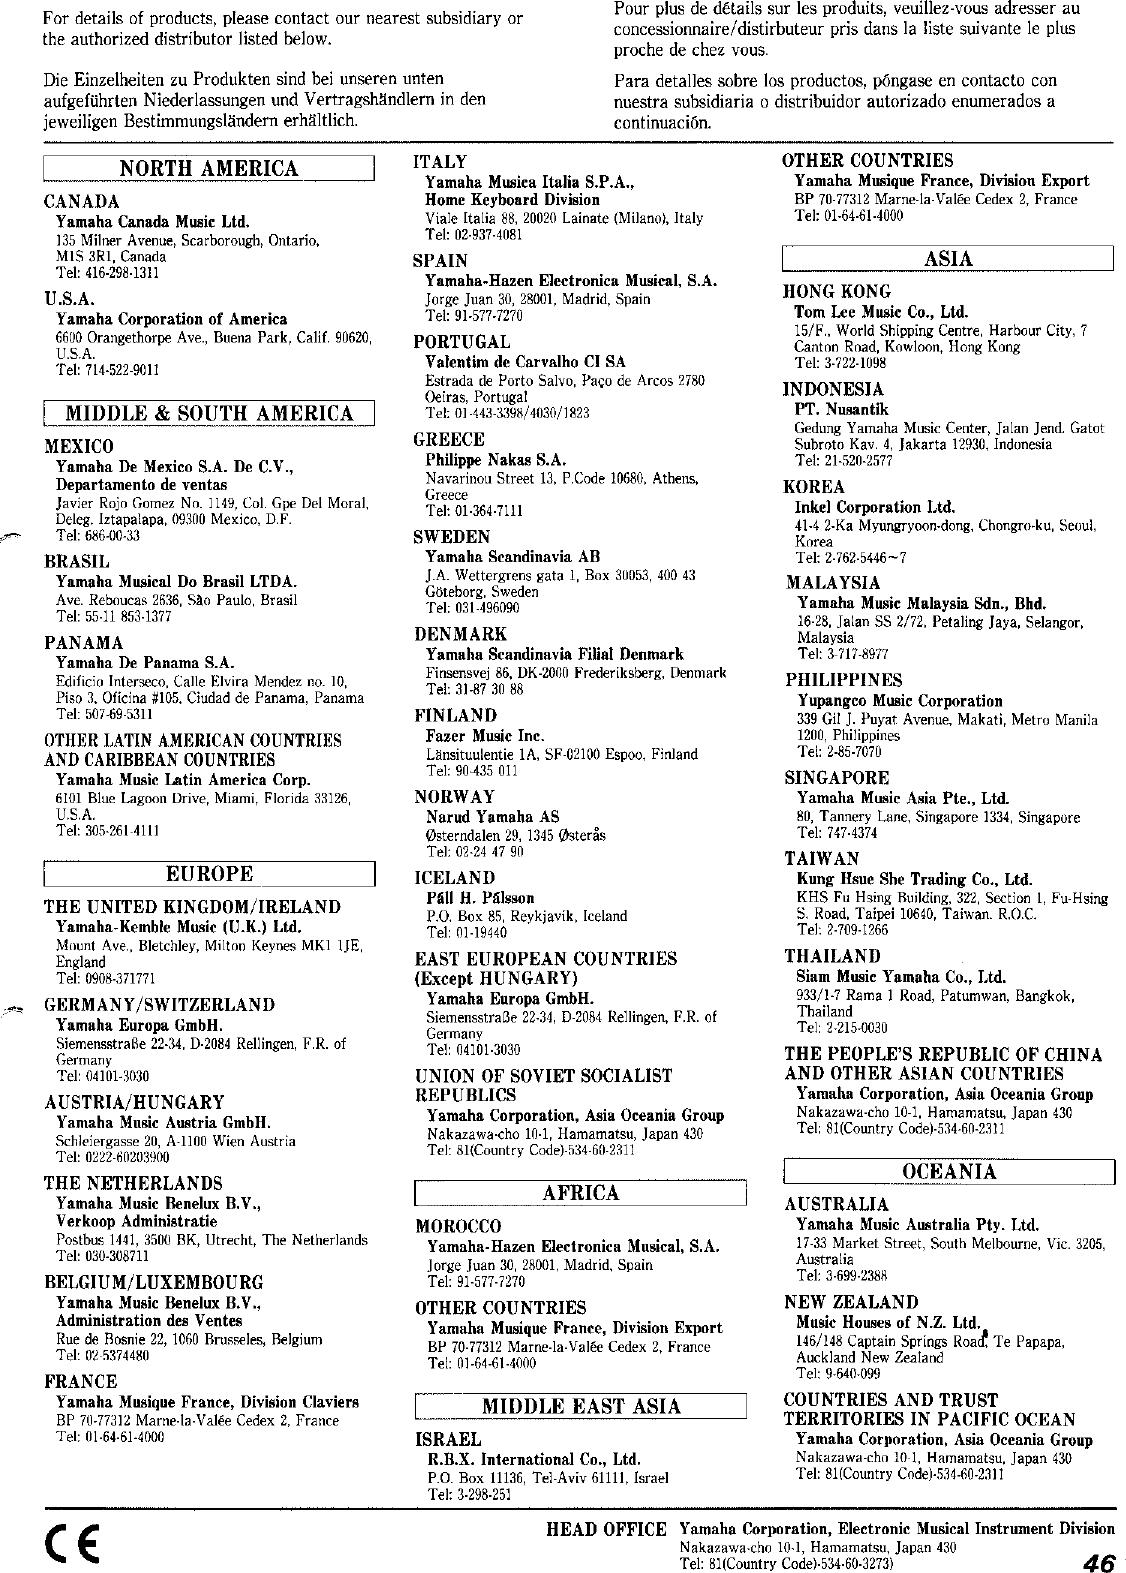 Yamaha PSS 101/PSS 102 Owner's Manual (Image) PSS102F